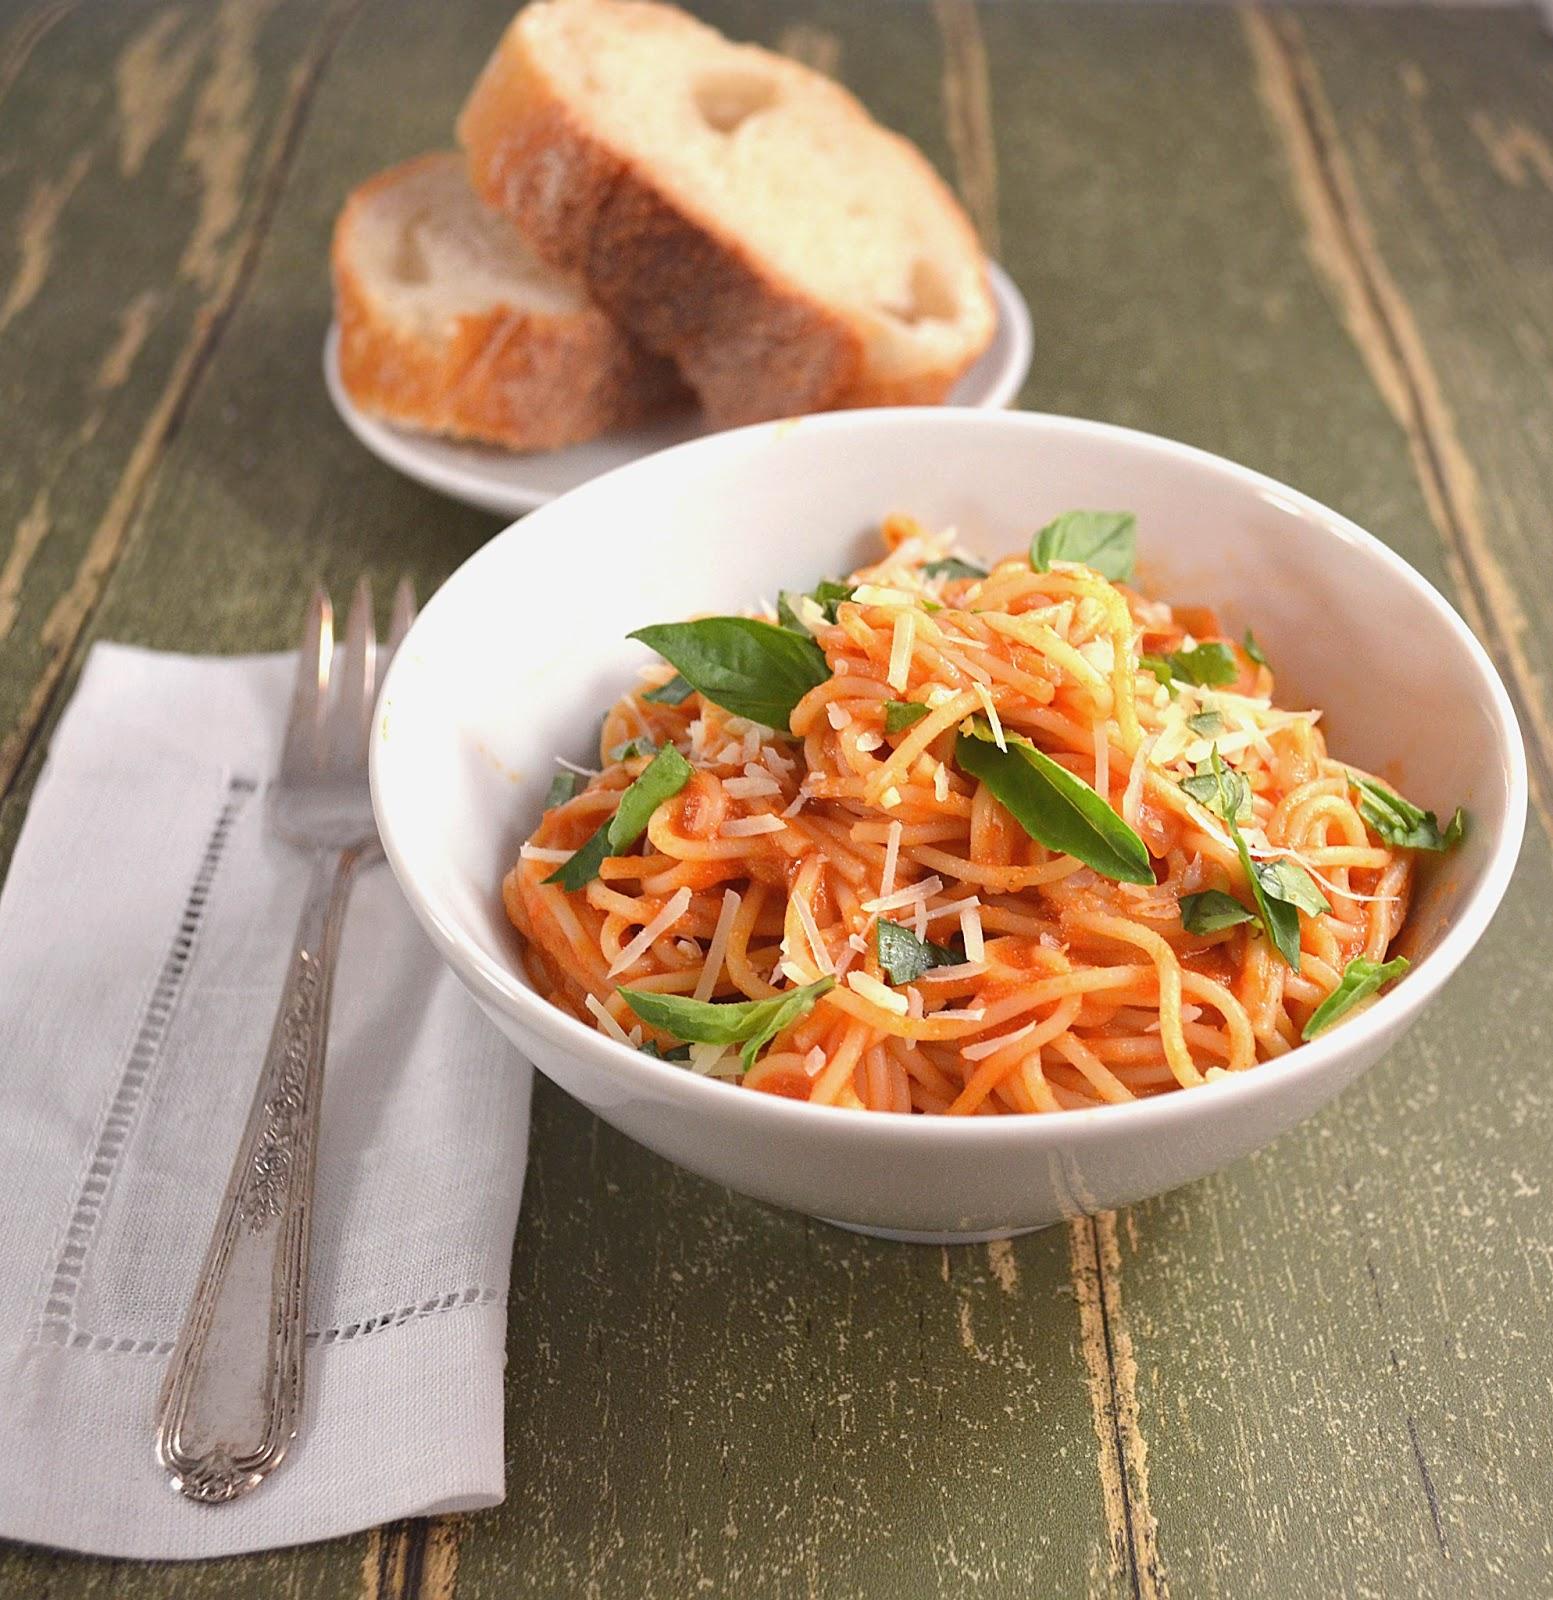 Pasta with a Light Tomato-Basil Cream Sauce | Vintage Kitchen